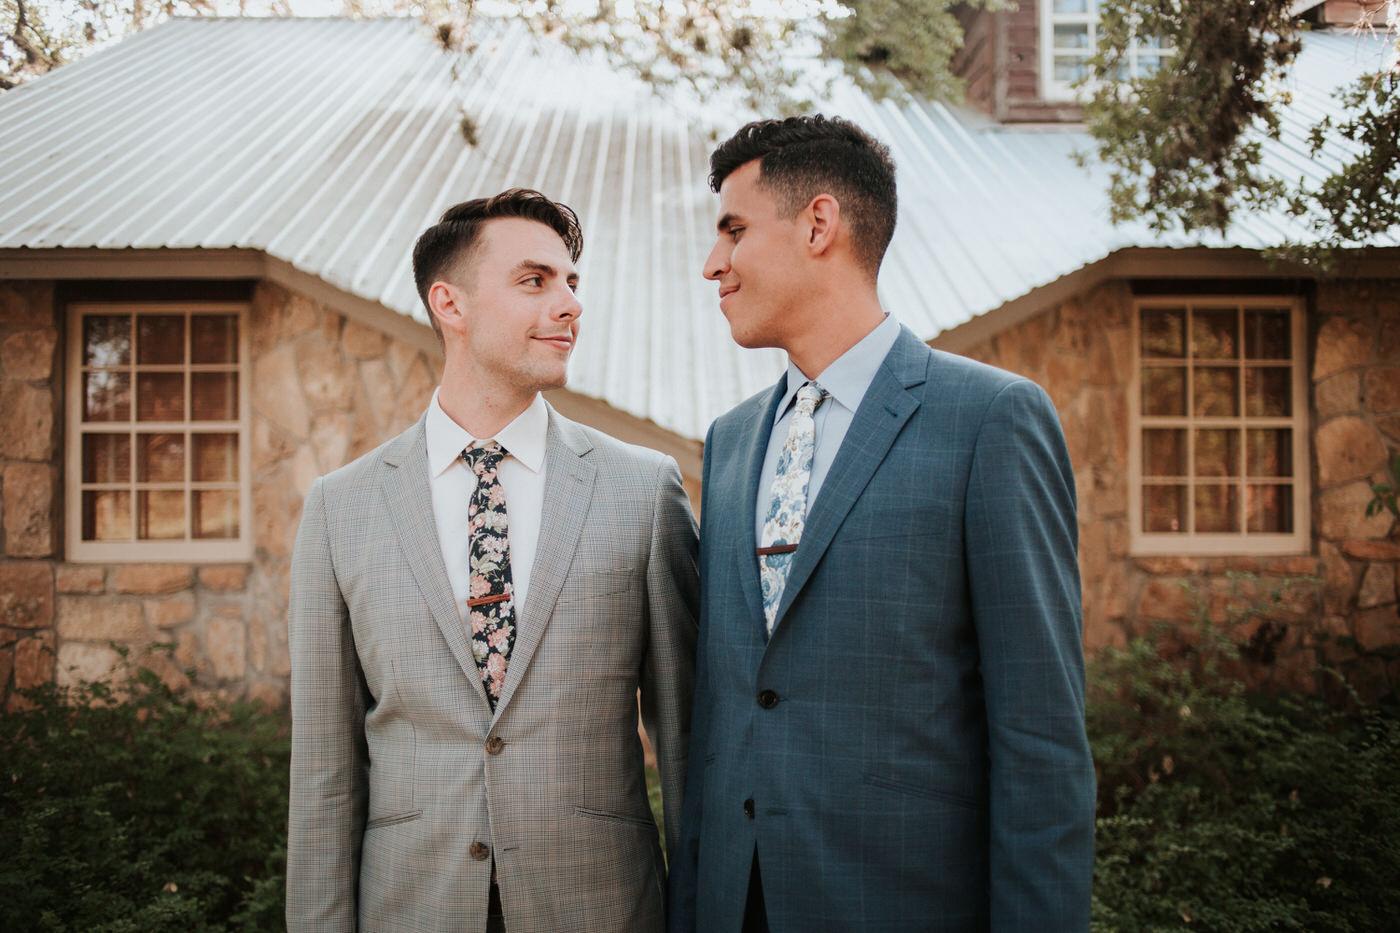 Riverhouse at Pedernales LGBTQ Wedding - Diana Ascarrunz Photography -924.jpg